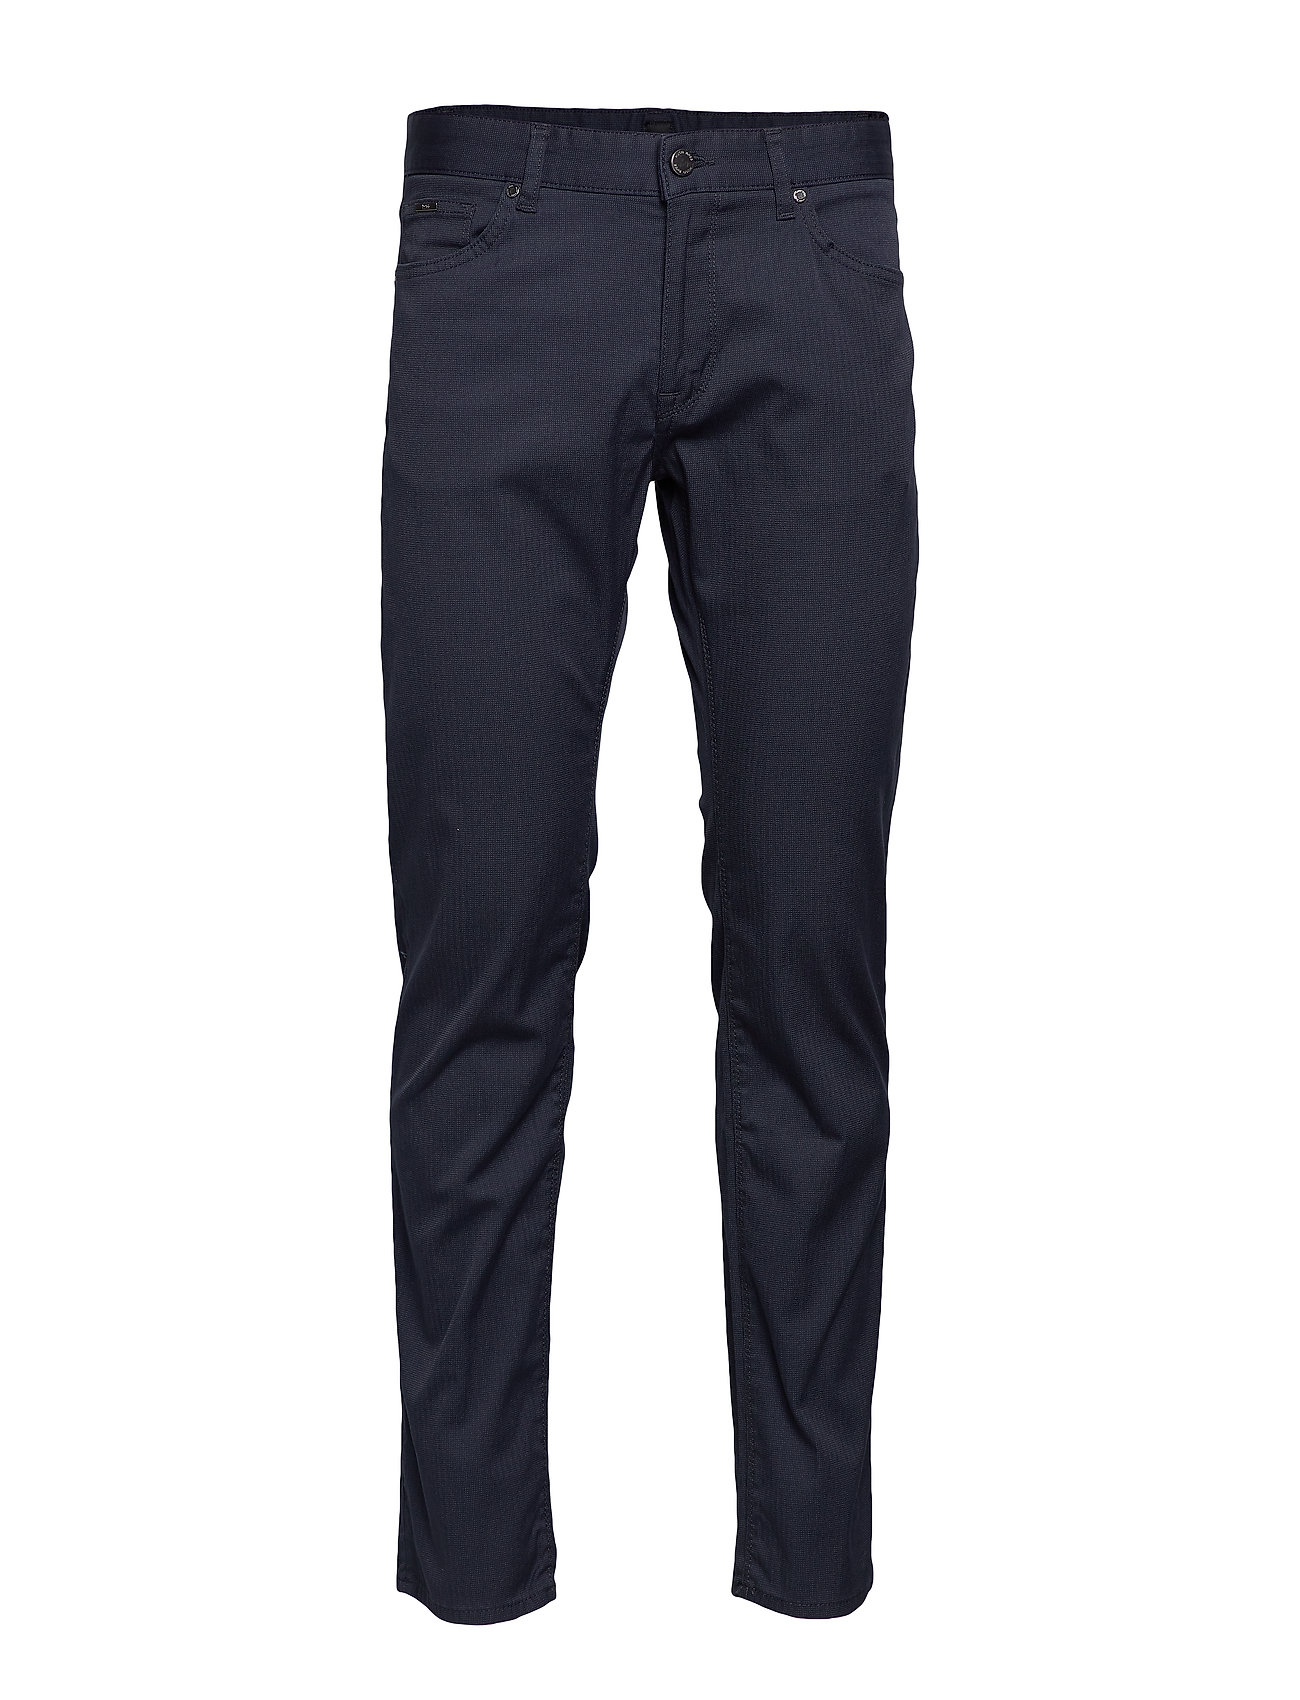 BOSS Business Wear Maine3-20 - DARK BLUE